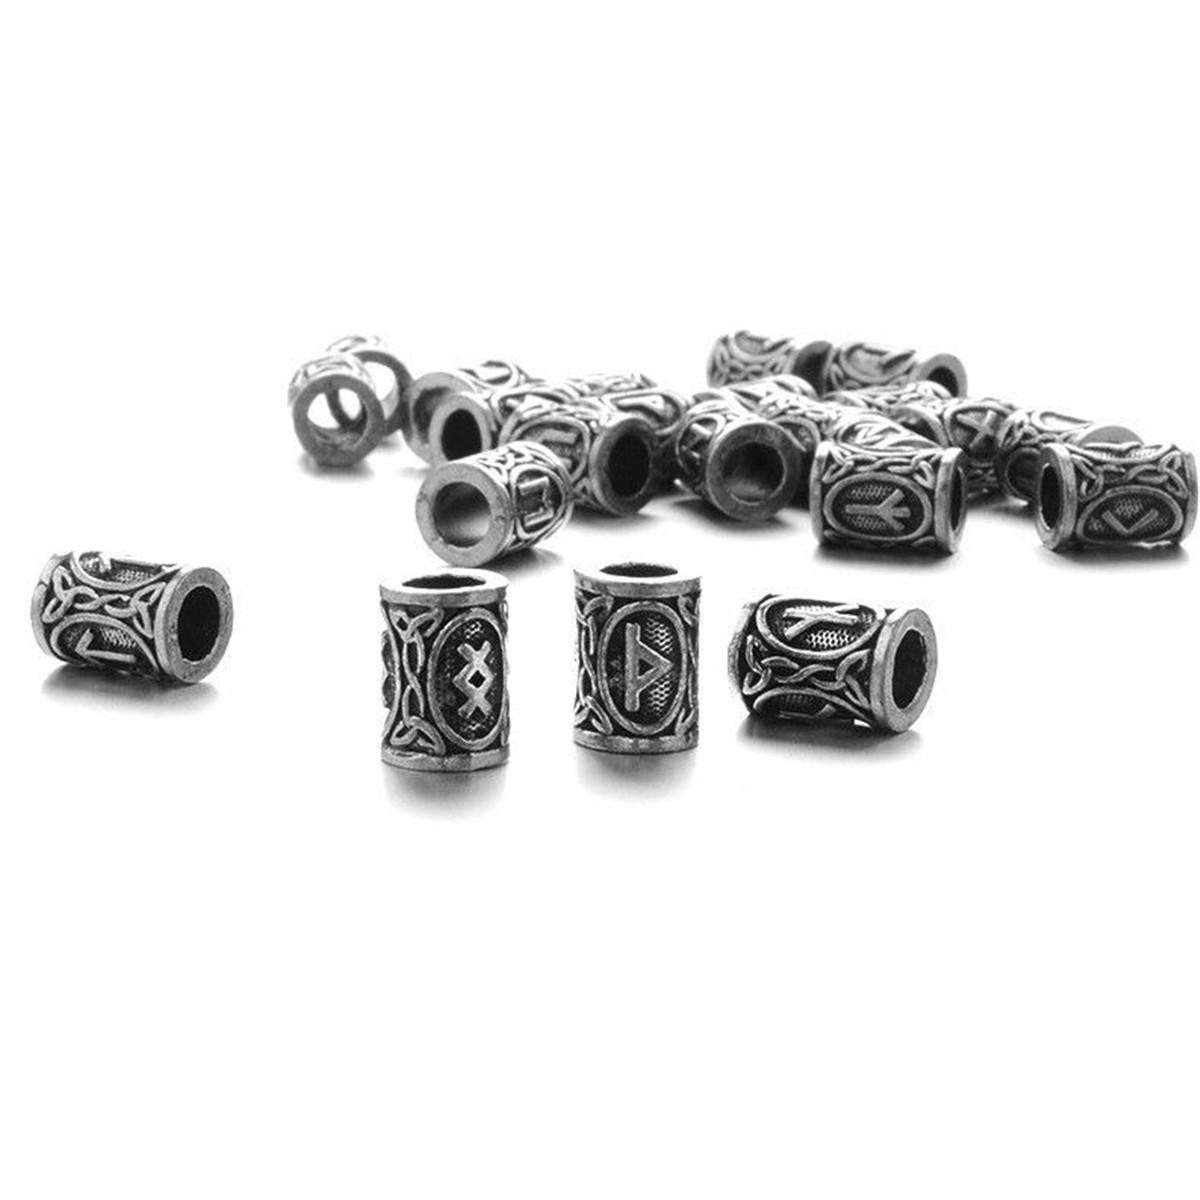 1 ~ 24pcs Norse Viking Rune Beads Jewelry Making À faire soi-même Cheveux Barbe Bracelet Collier